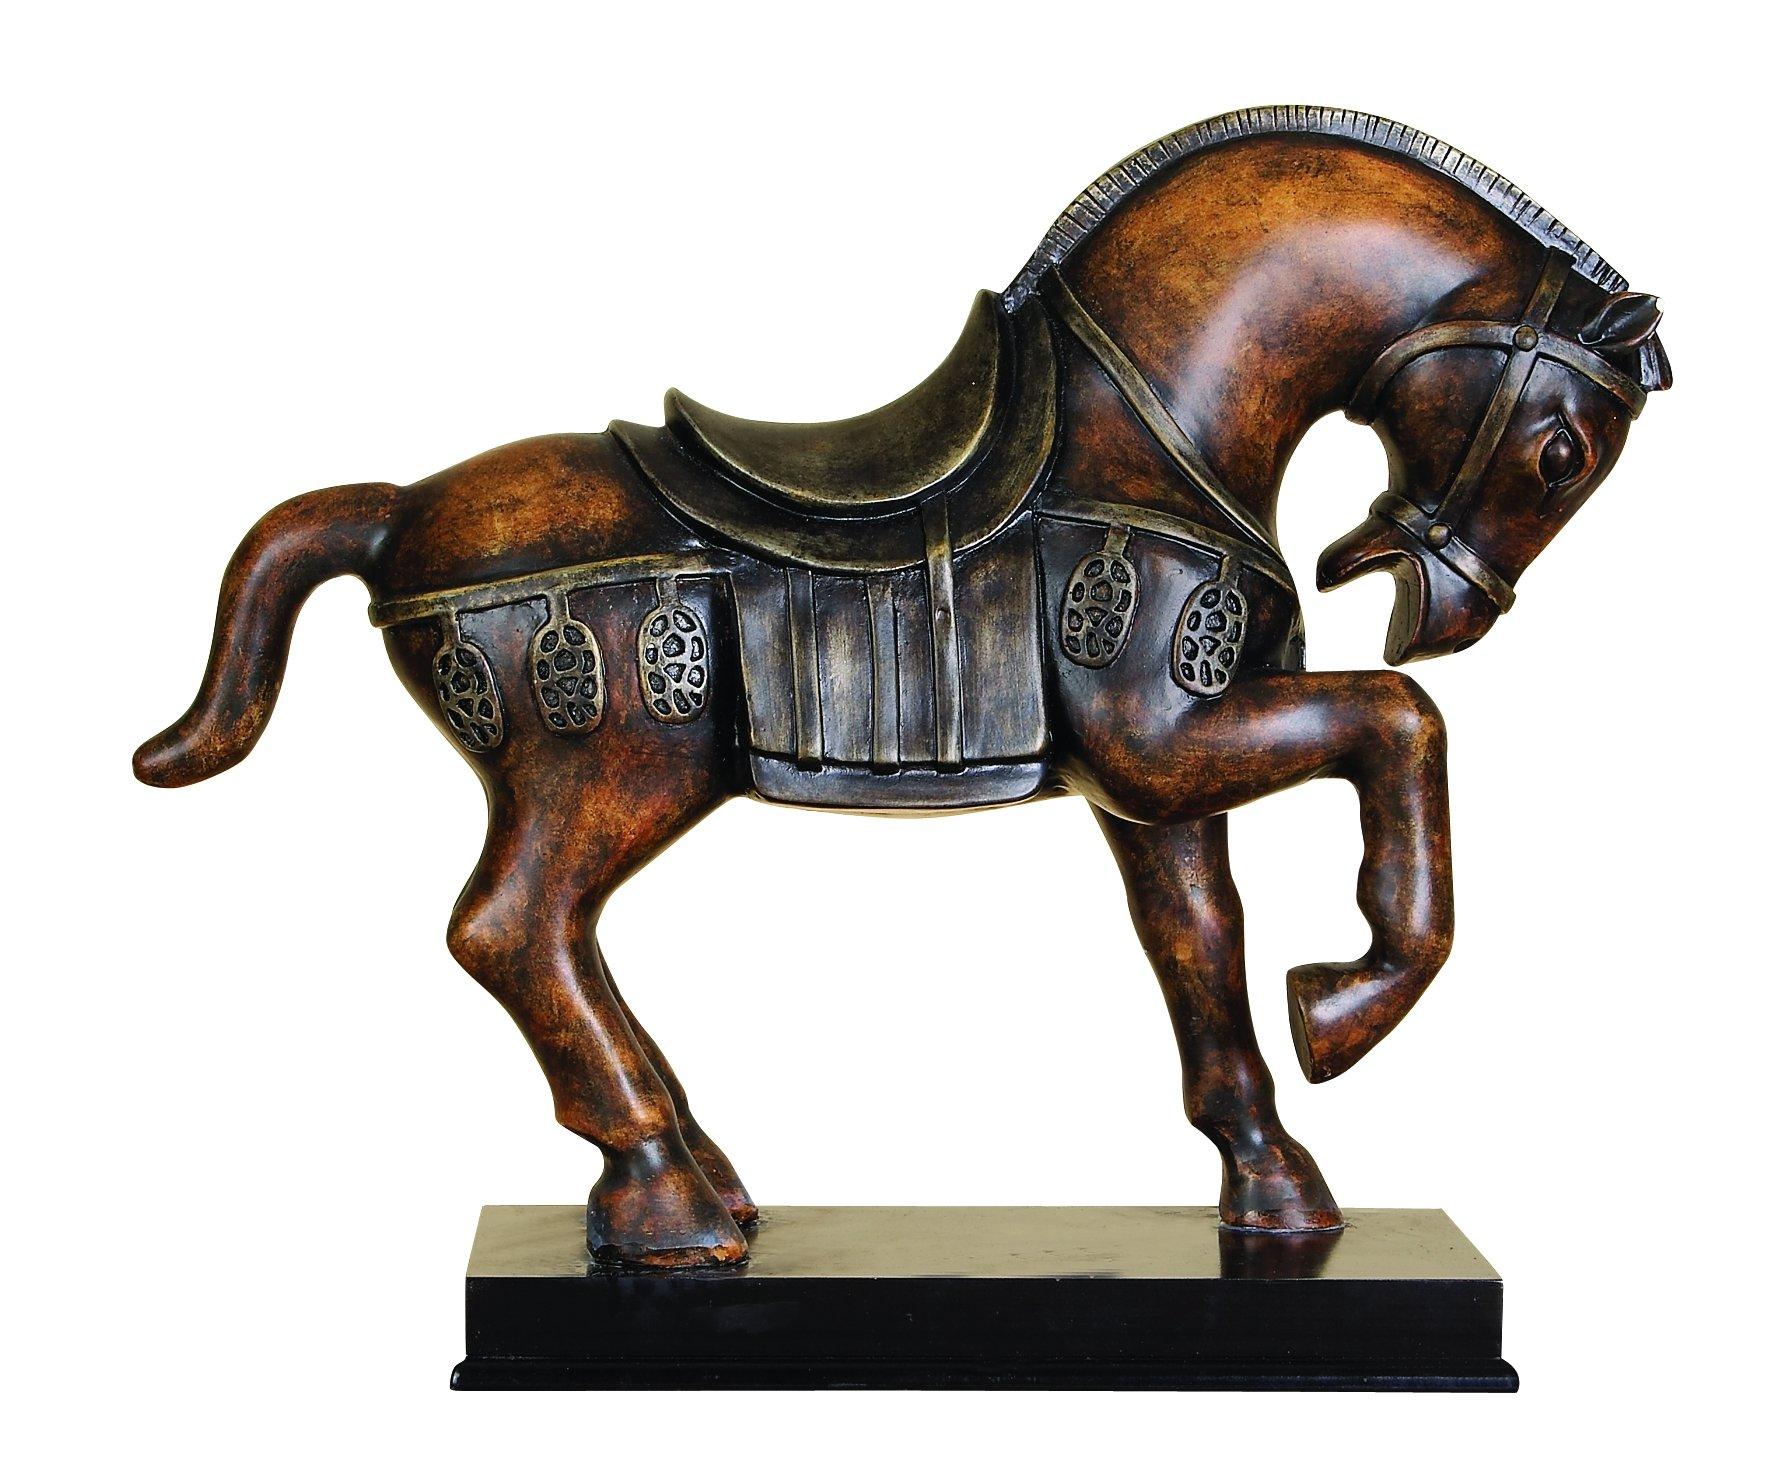 Benzara 22465 Polystone Tang Horse Unique Table Accent Animal Statue by Benzara (BENZD)